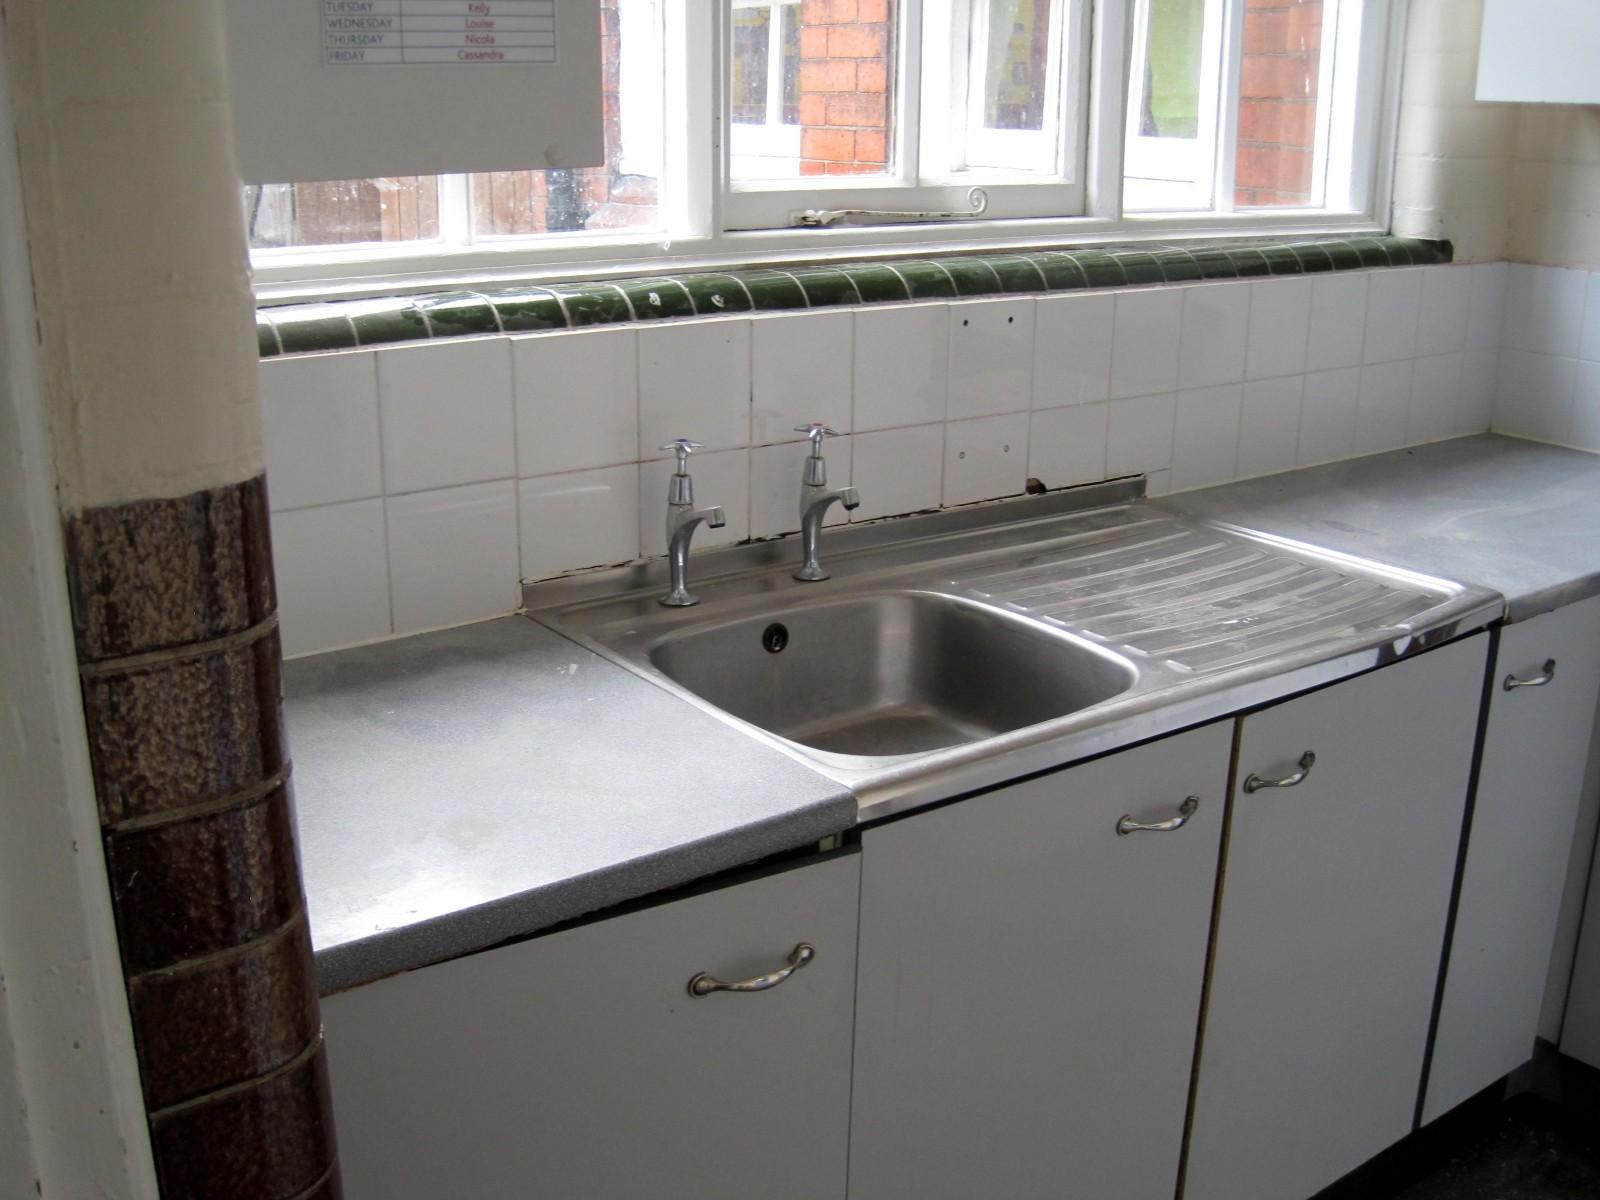 Old Kitchen Sinks Befon for